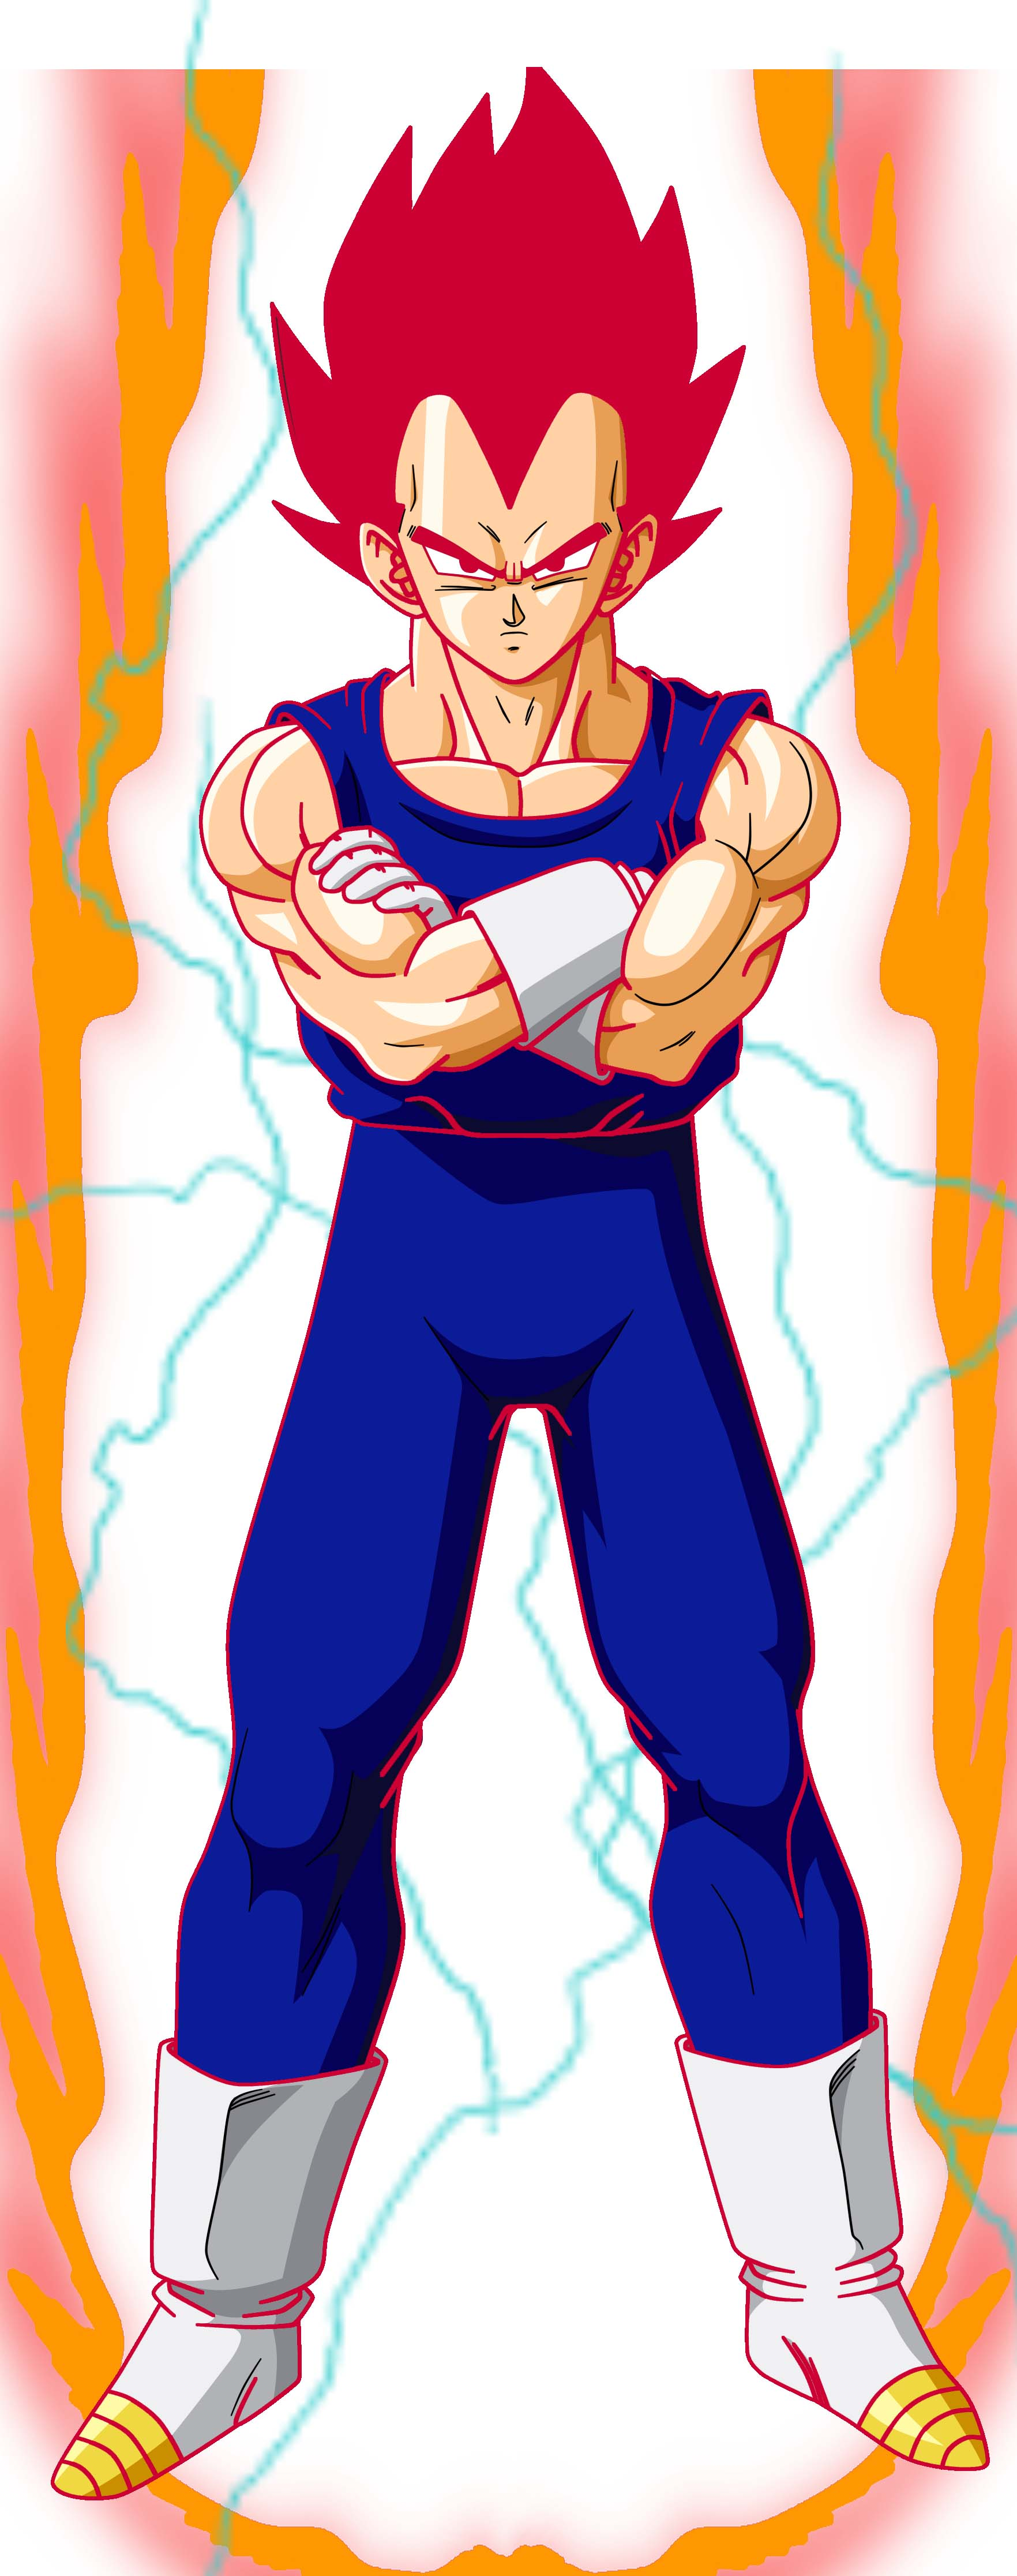 Super Saiyan God 2 Vegeta